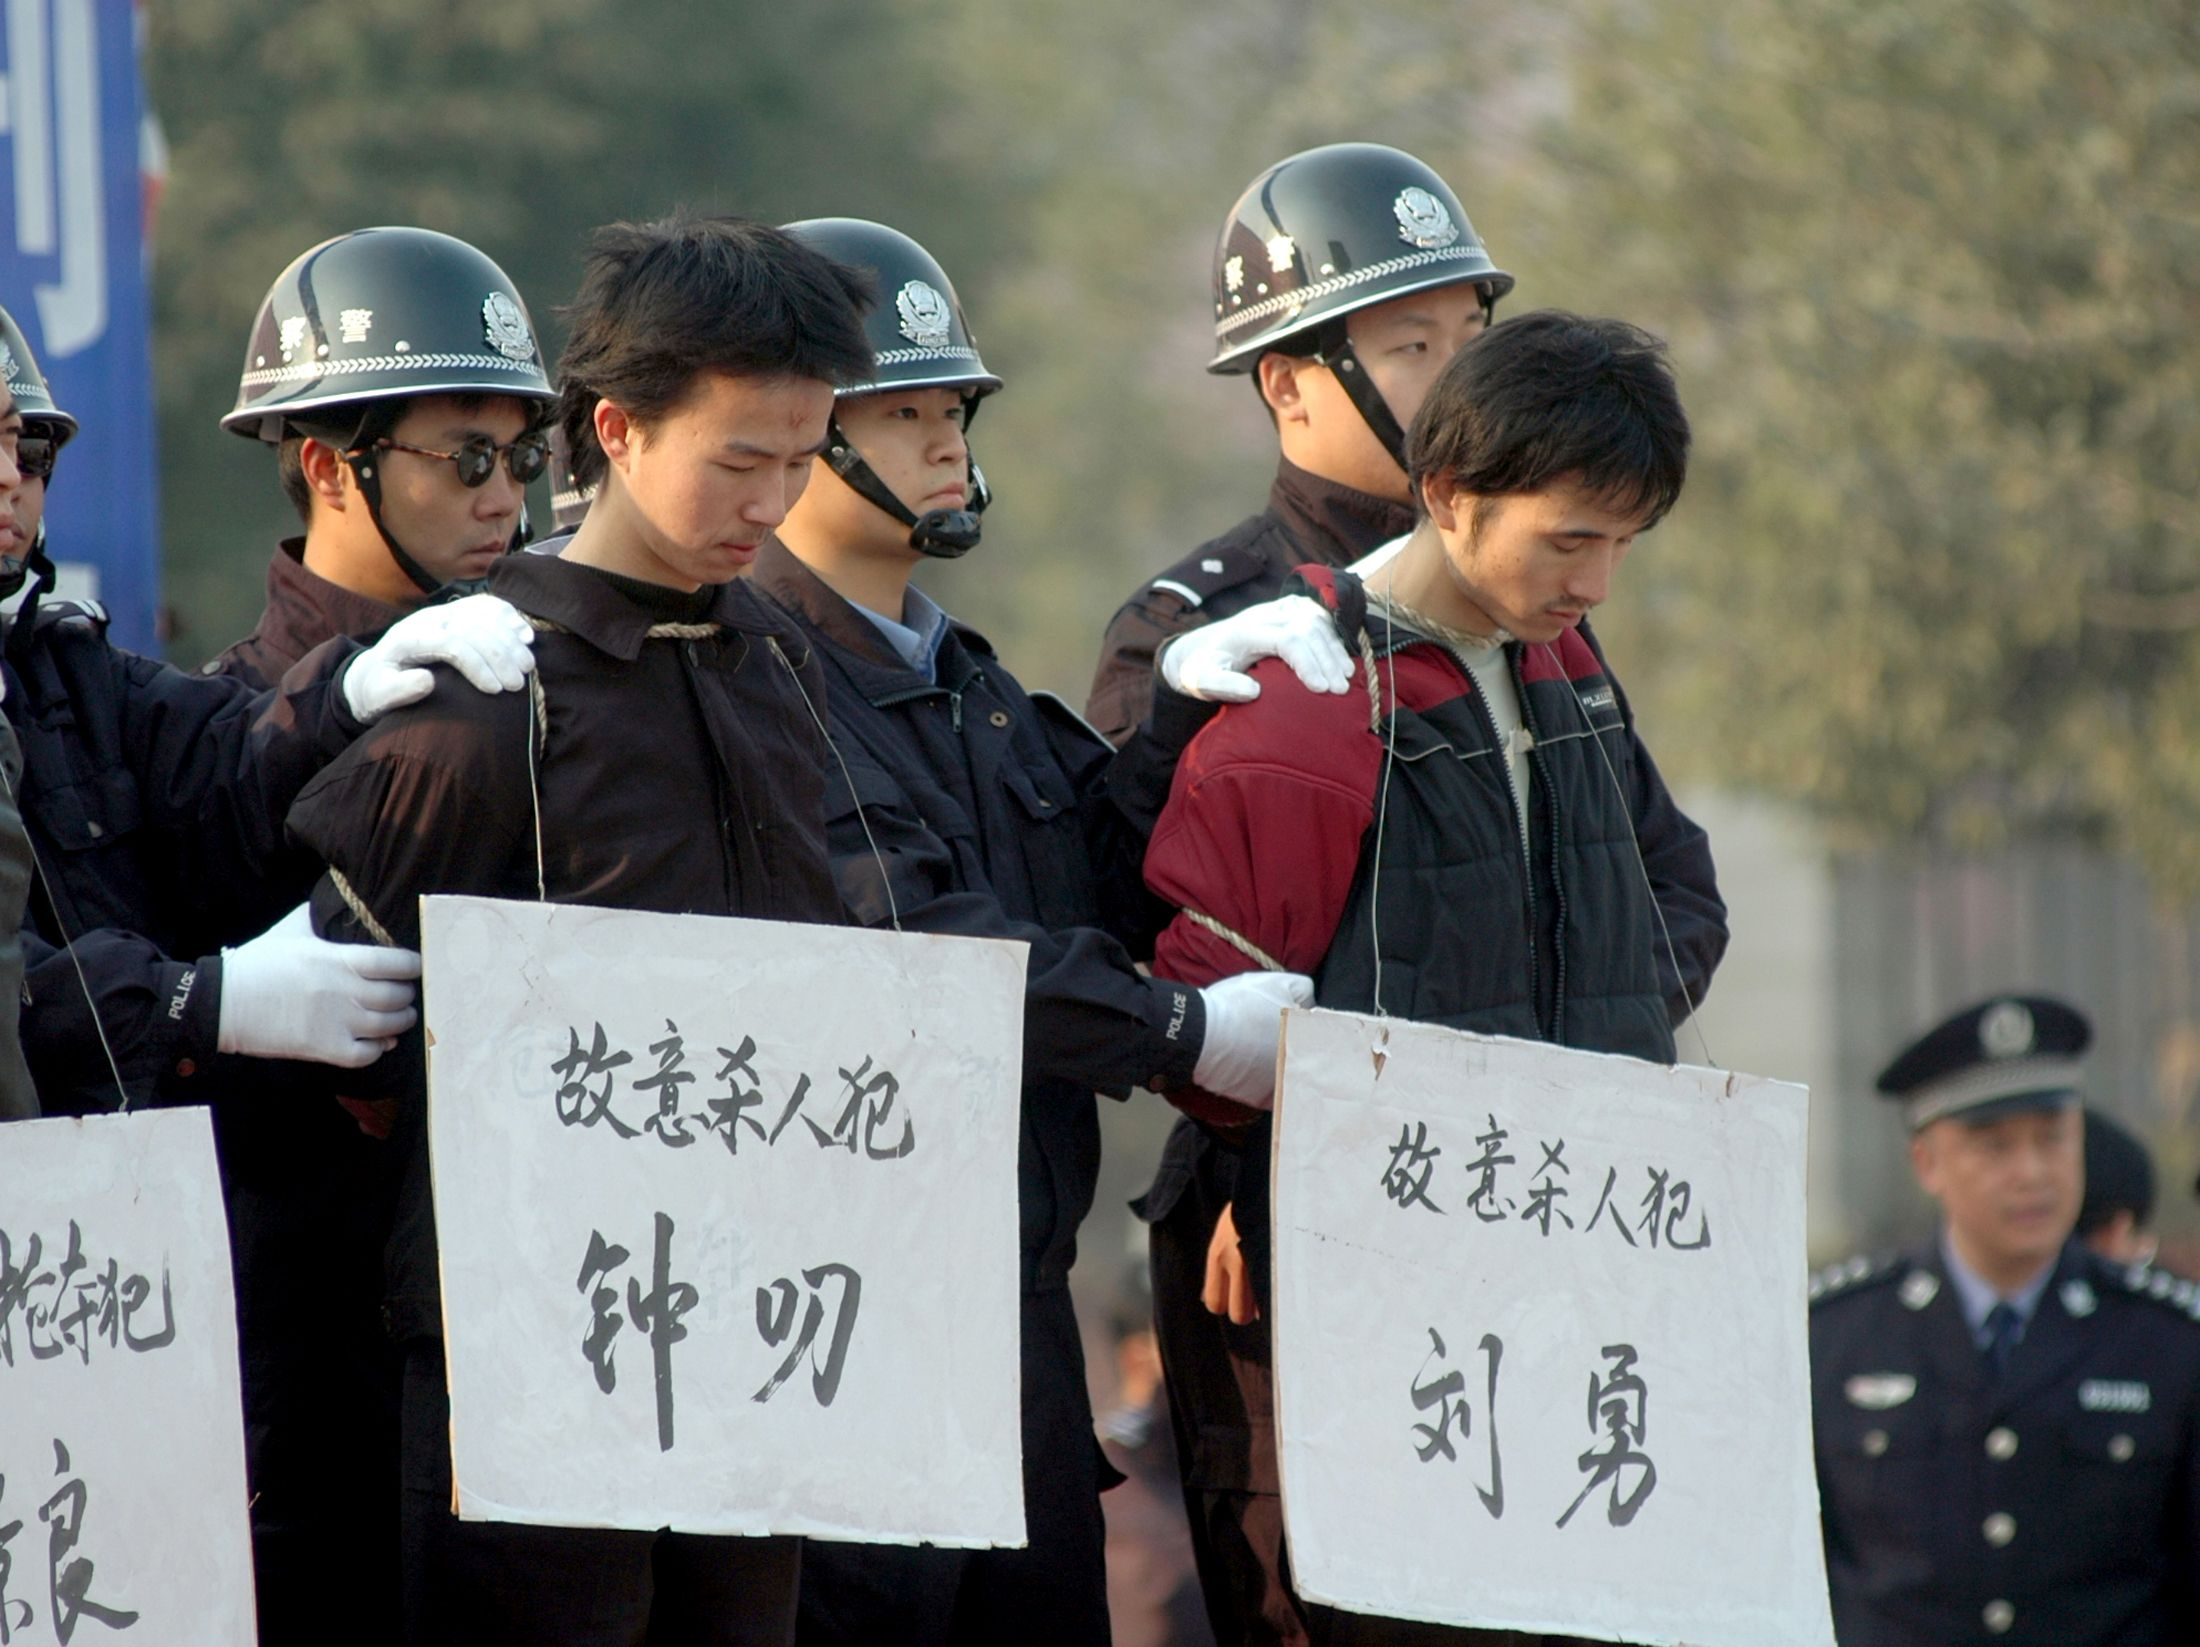 https://i0.wp.com/s.newsweek.com/sites/www.newsweek.com/files/styles/lg/public/2014/10/21/china-death-penalty.jpg